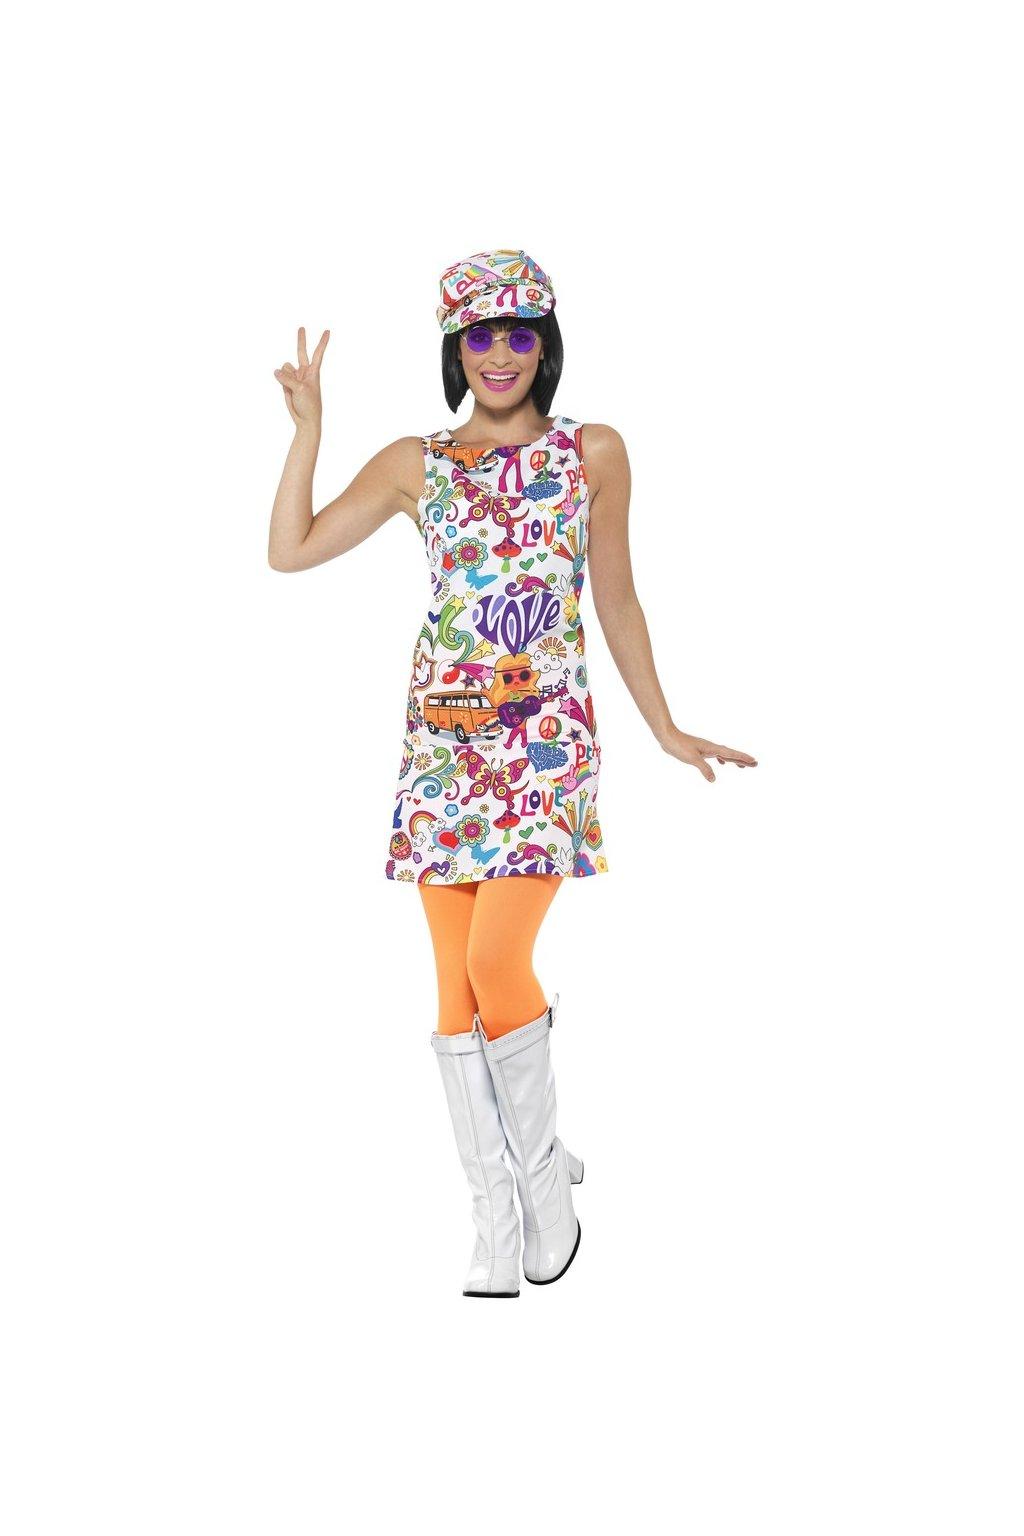 Groovy Chick - dámský kostým Hippies 60.léta